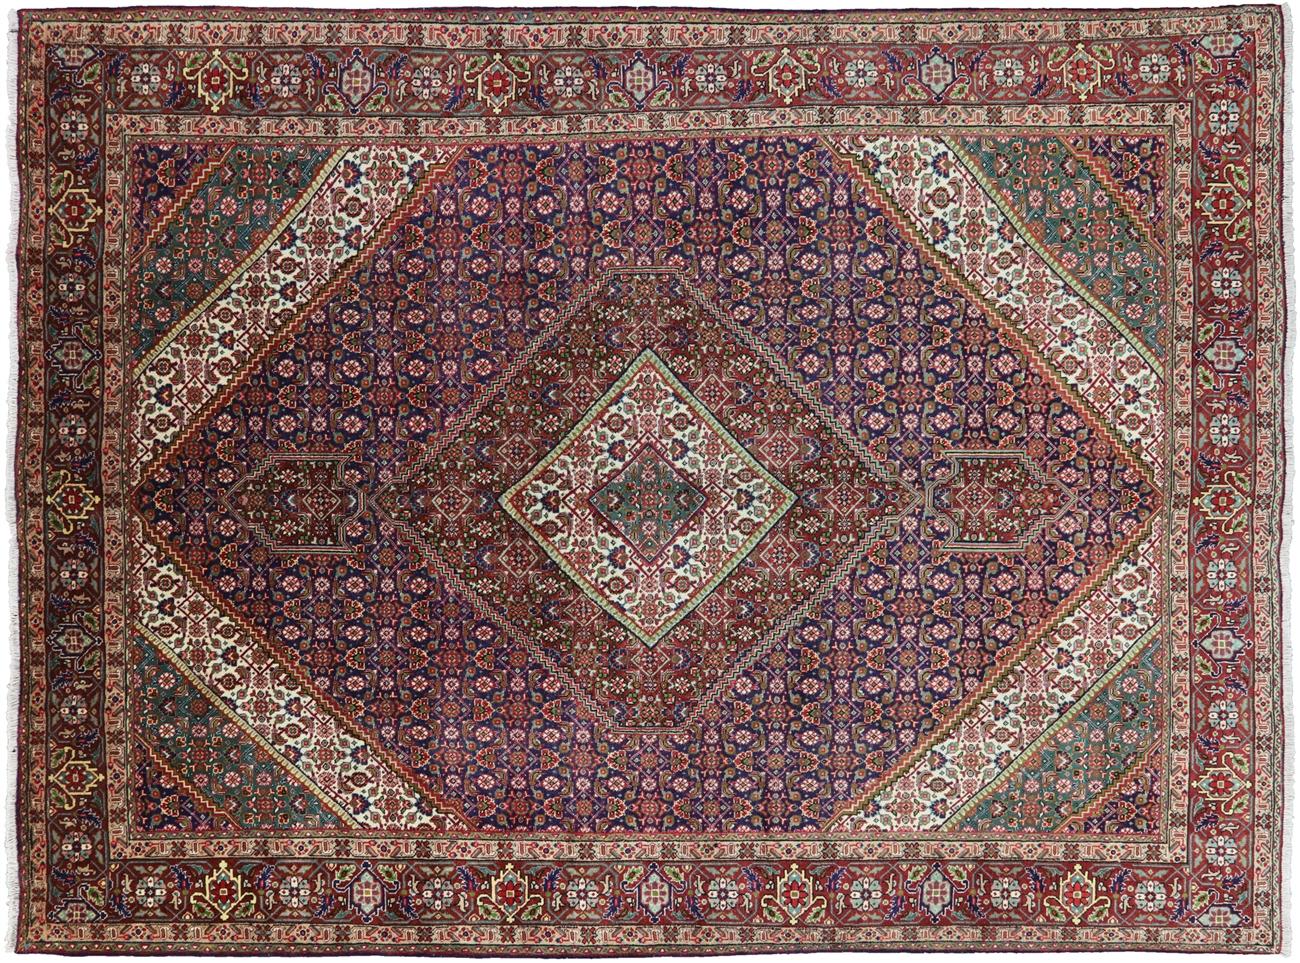 New Oriental Authentic Persian Tabriz Fish Design Handmade Area Rug